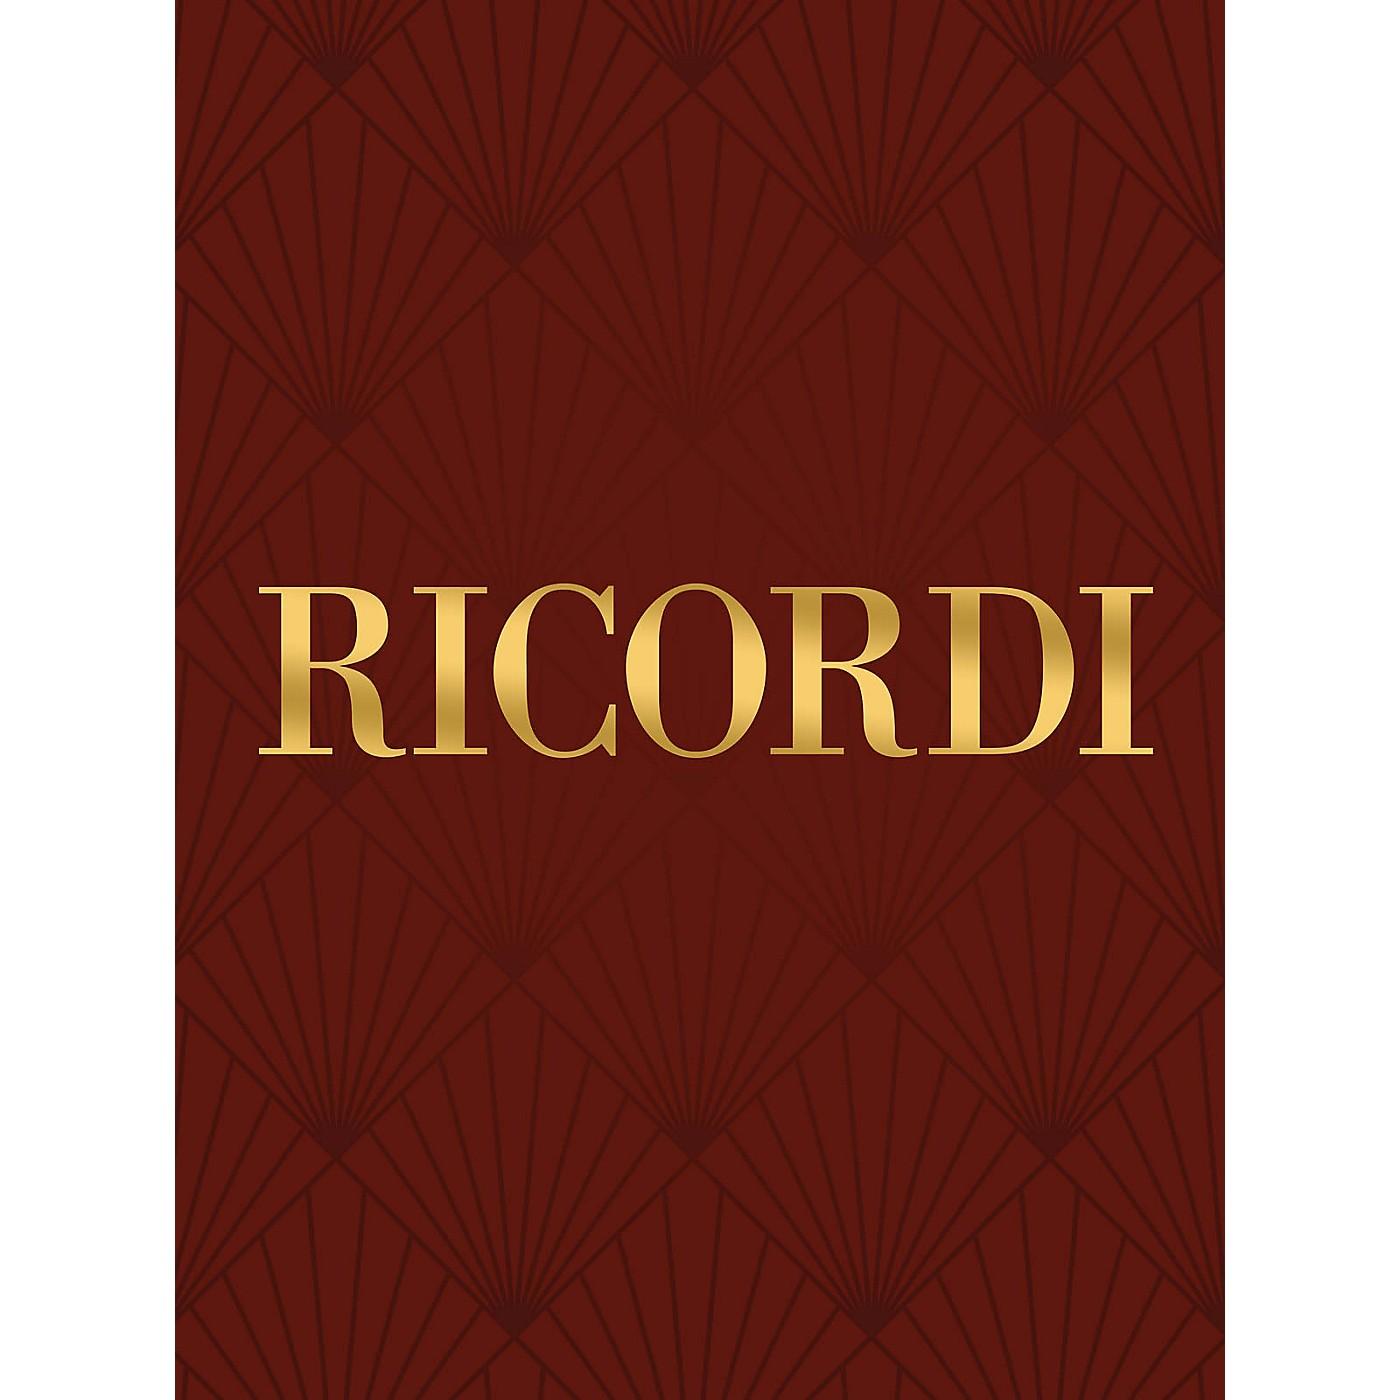 Ricordi La Scuola del Flauto, Op. 51 - Level IV Woodwind Method Composed by L Hugues Edited by Alberto Veggetti thumbnail